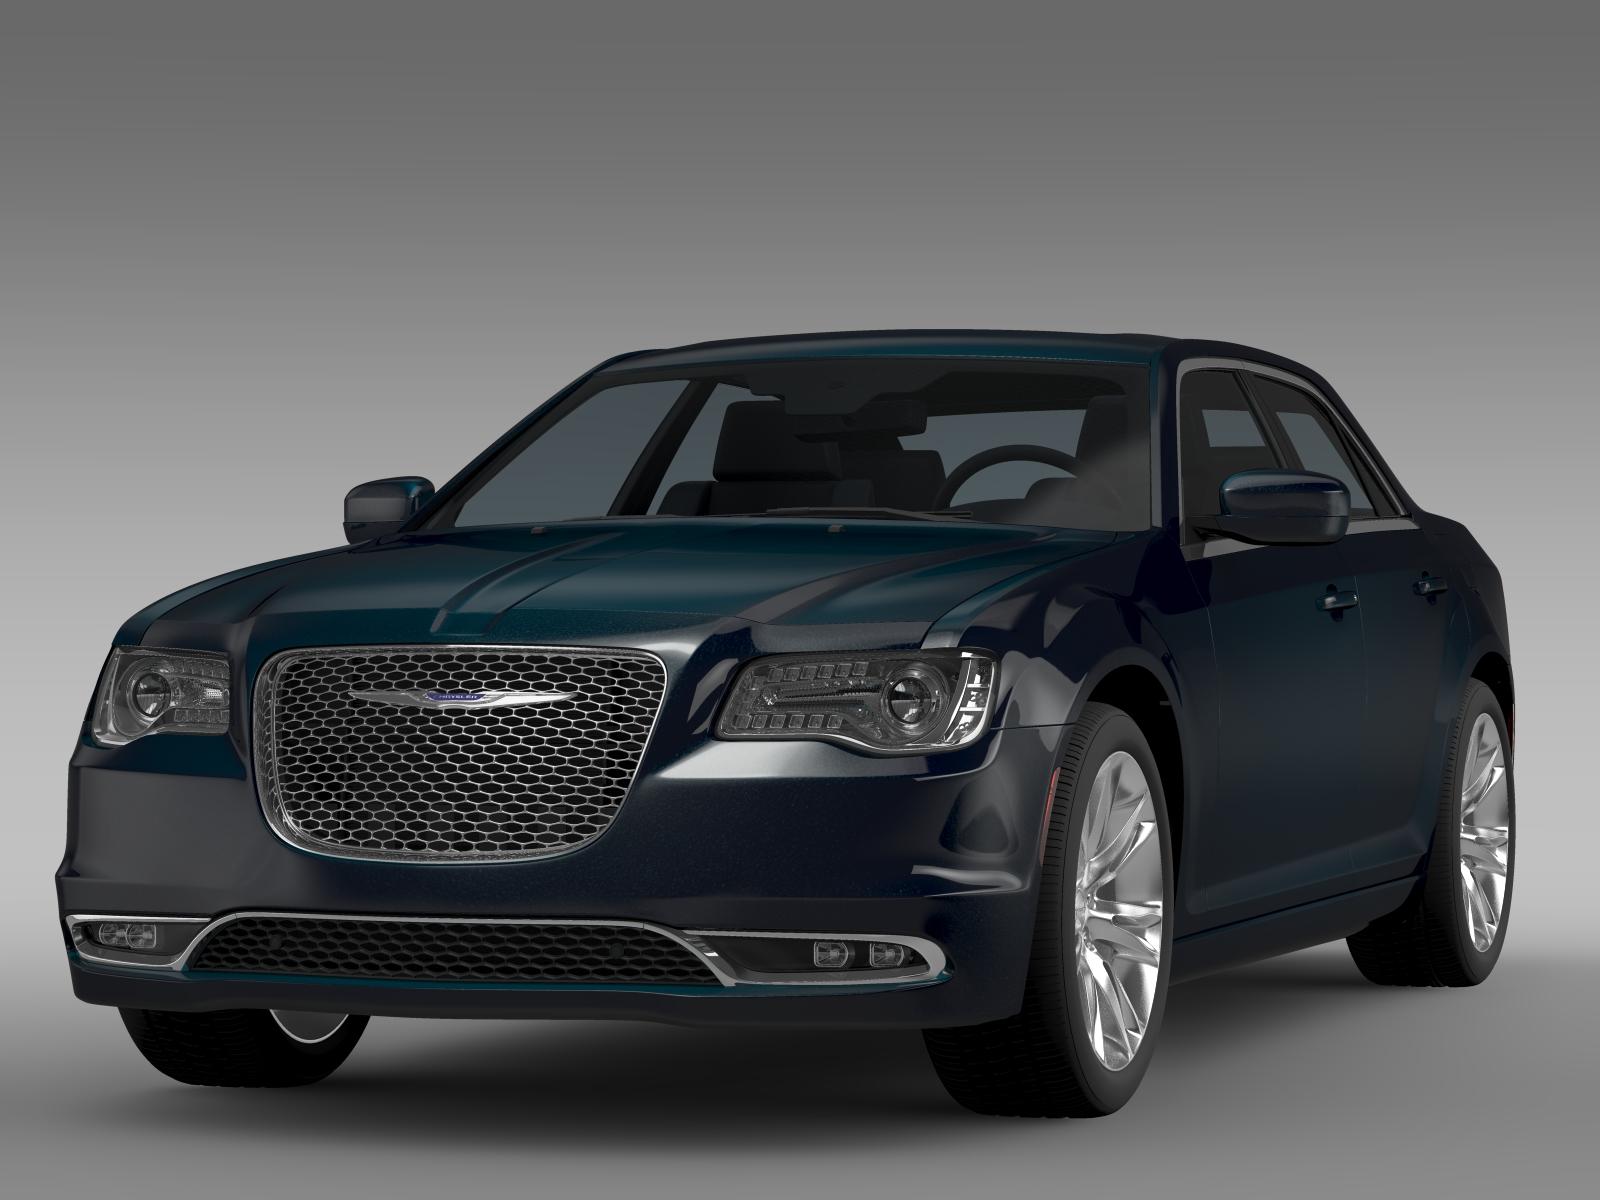 chrysler 300 c lx2 2016 3d model vehicles 3d models car 3ds max fbx c4d lwo lws lw ma mb obj ar vr. Black Bedroom Furniture Sets. Home Design Ideas